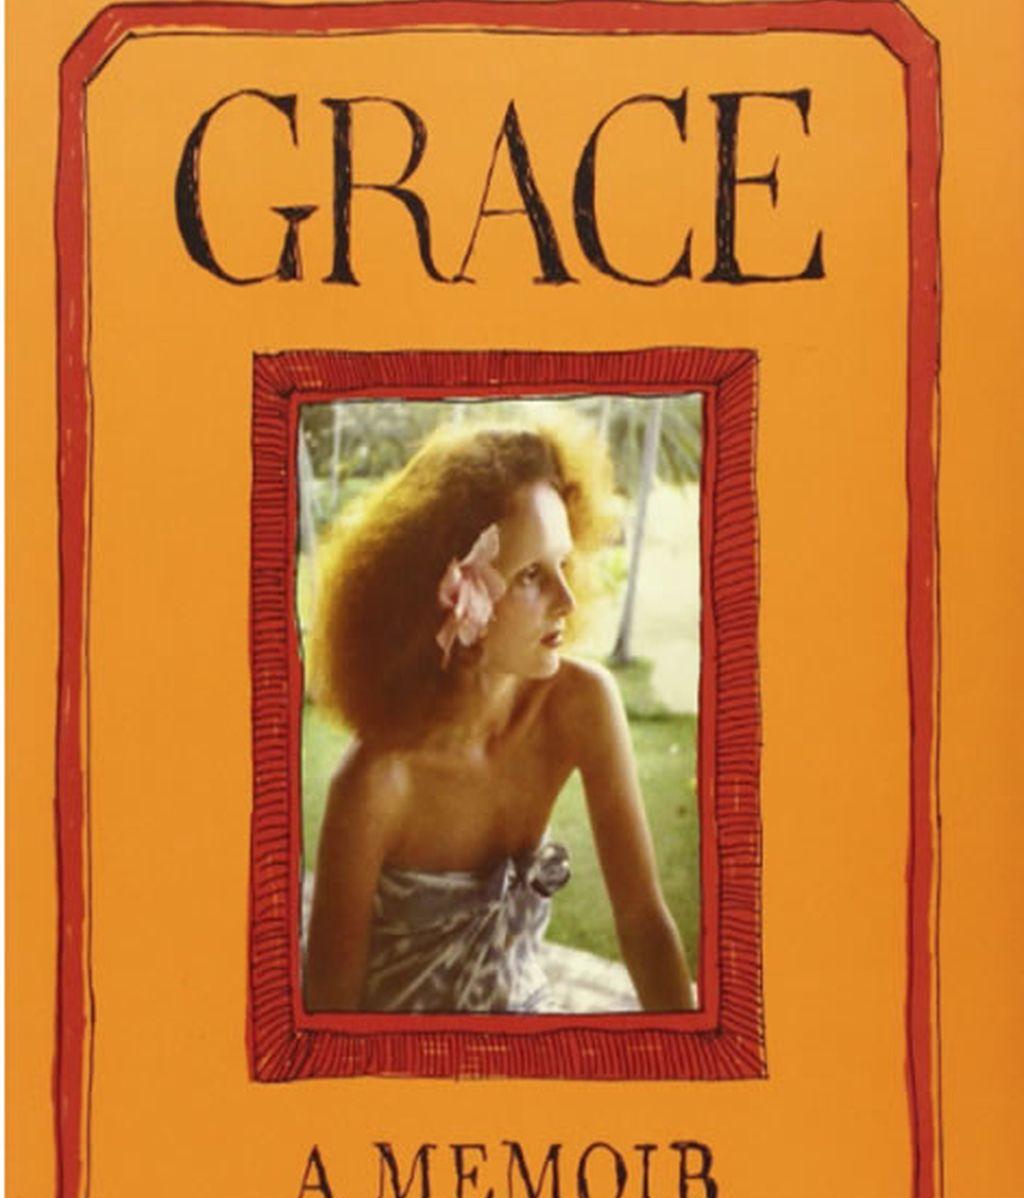 Grace: A Memoir. Grace Coddington. 35 €